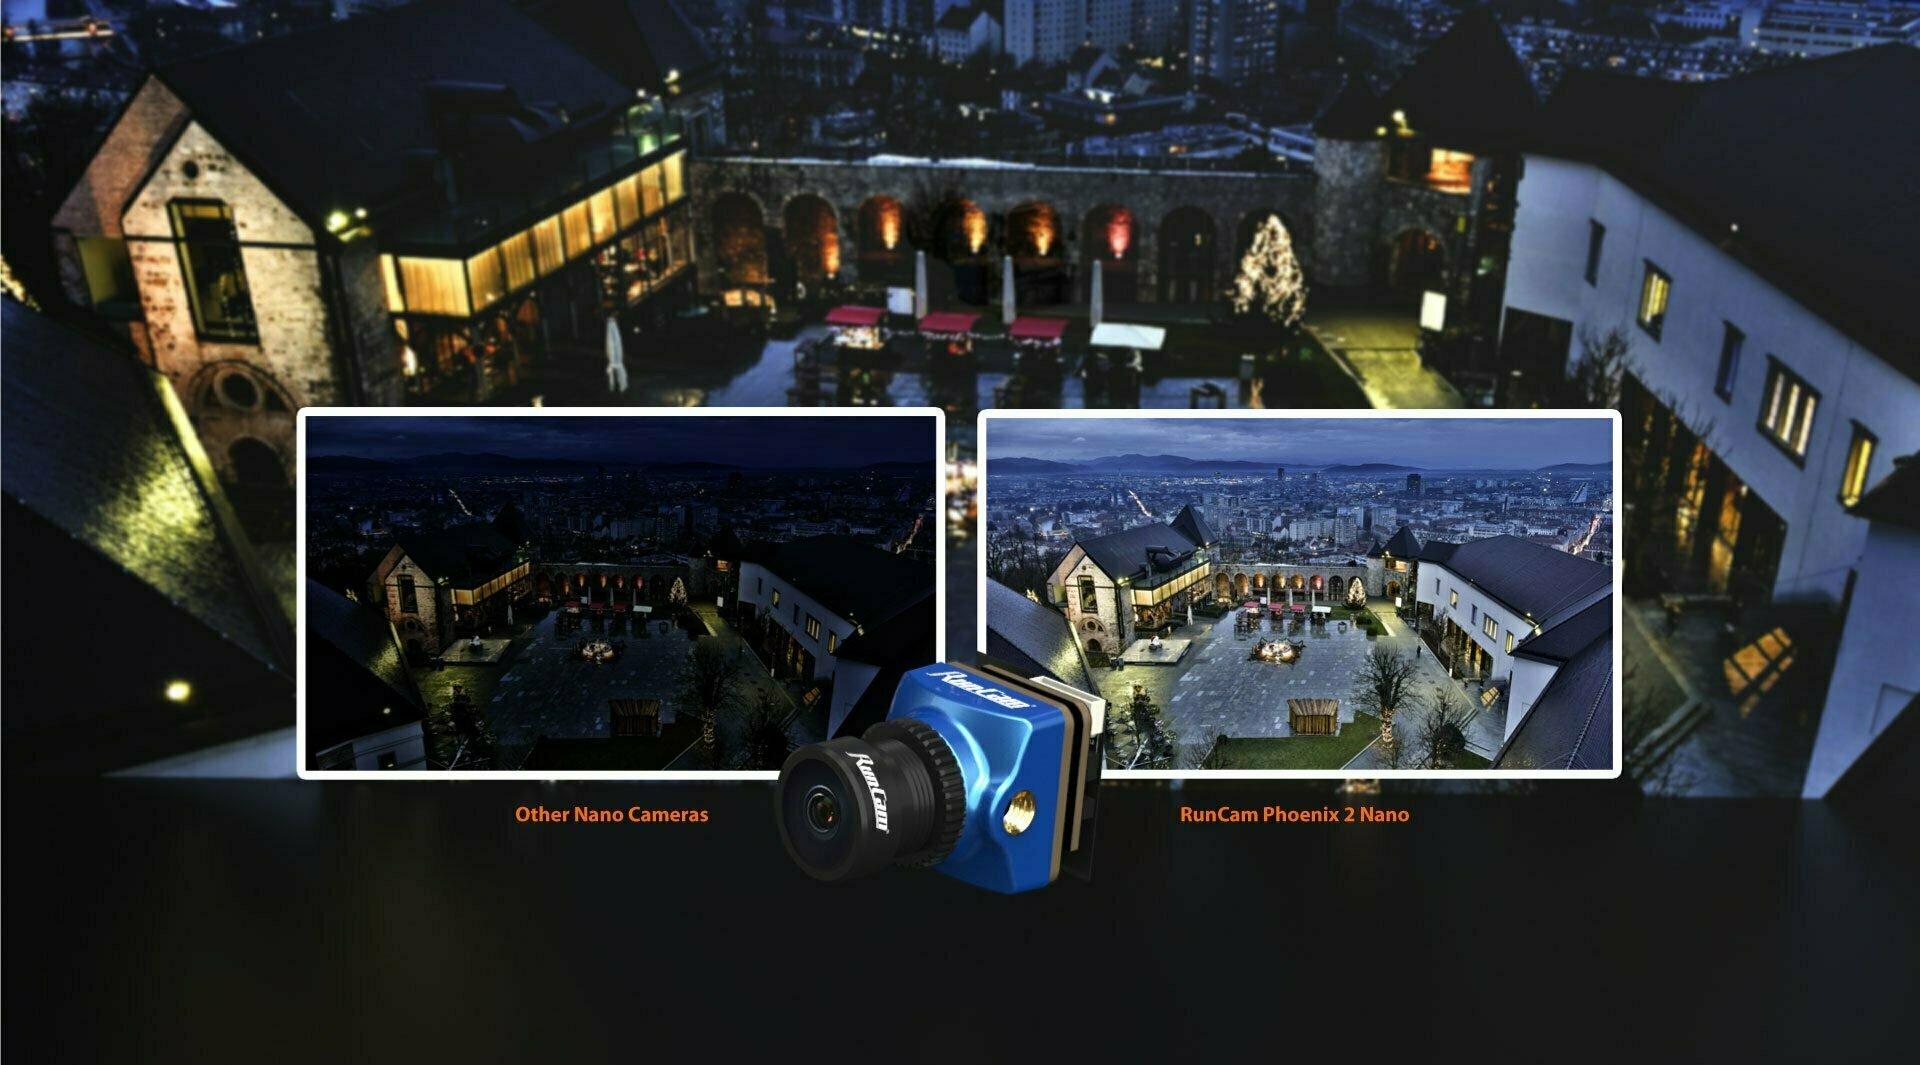 runcam phoenix 2 nano branding product fpv showcase picture mantisfpv.jfif e1590483667543